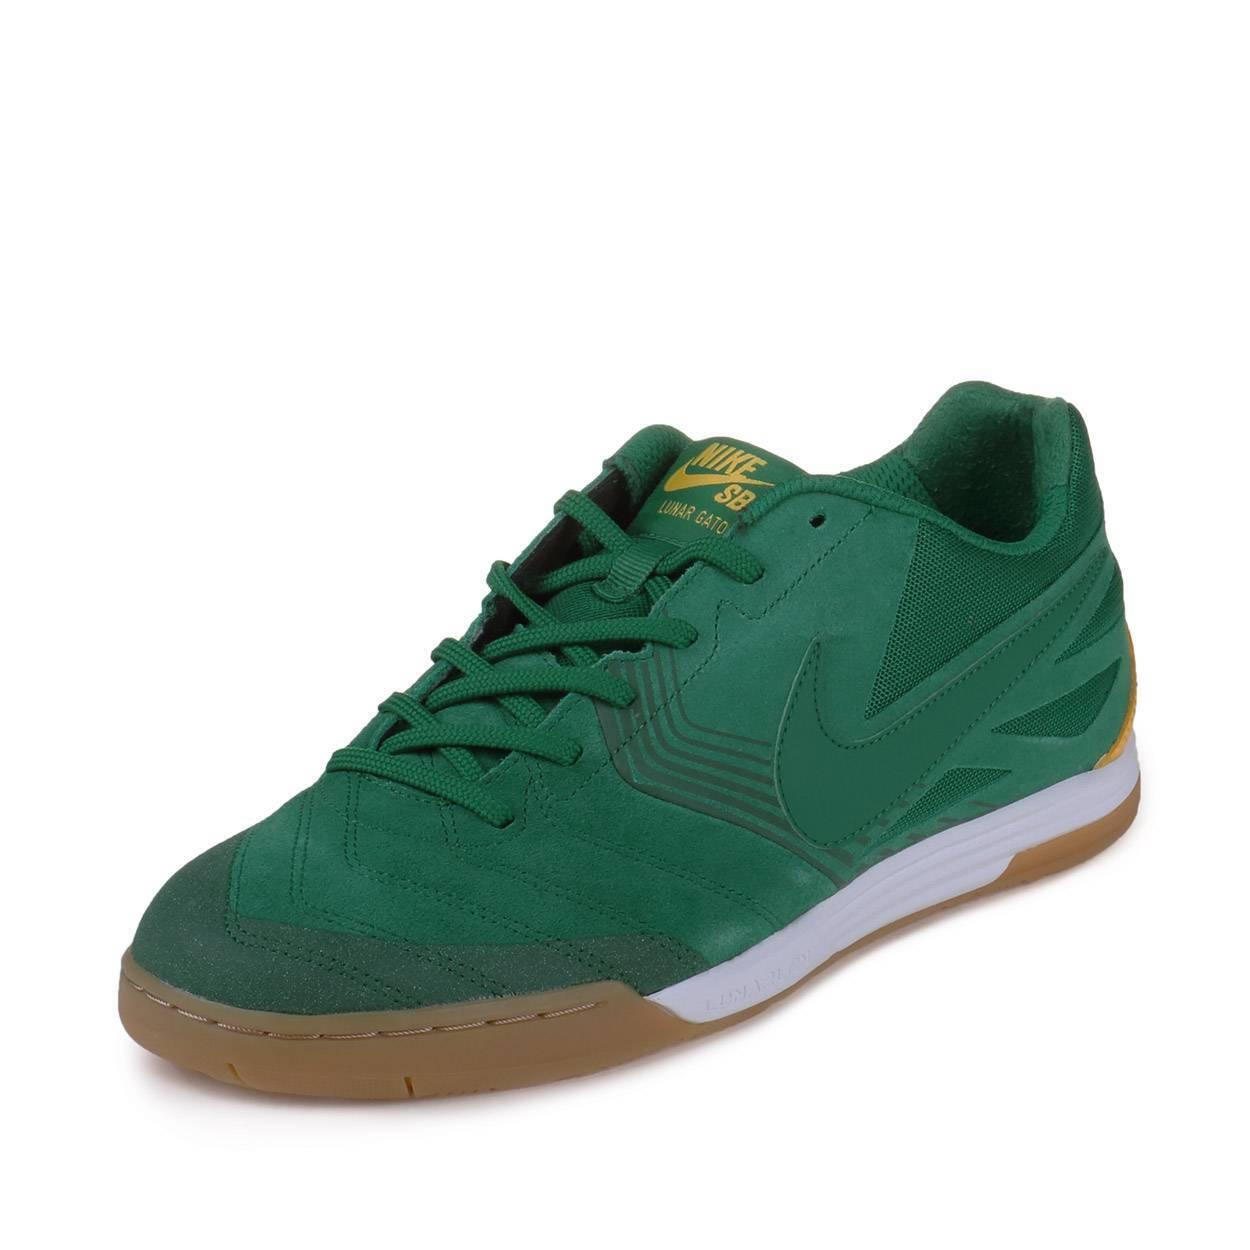 Nike SB Lunar Gato 631321-337 BRAZIL US Size mens 10 Lunarlon Indoor GREEN shoes